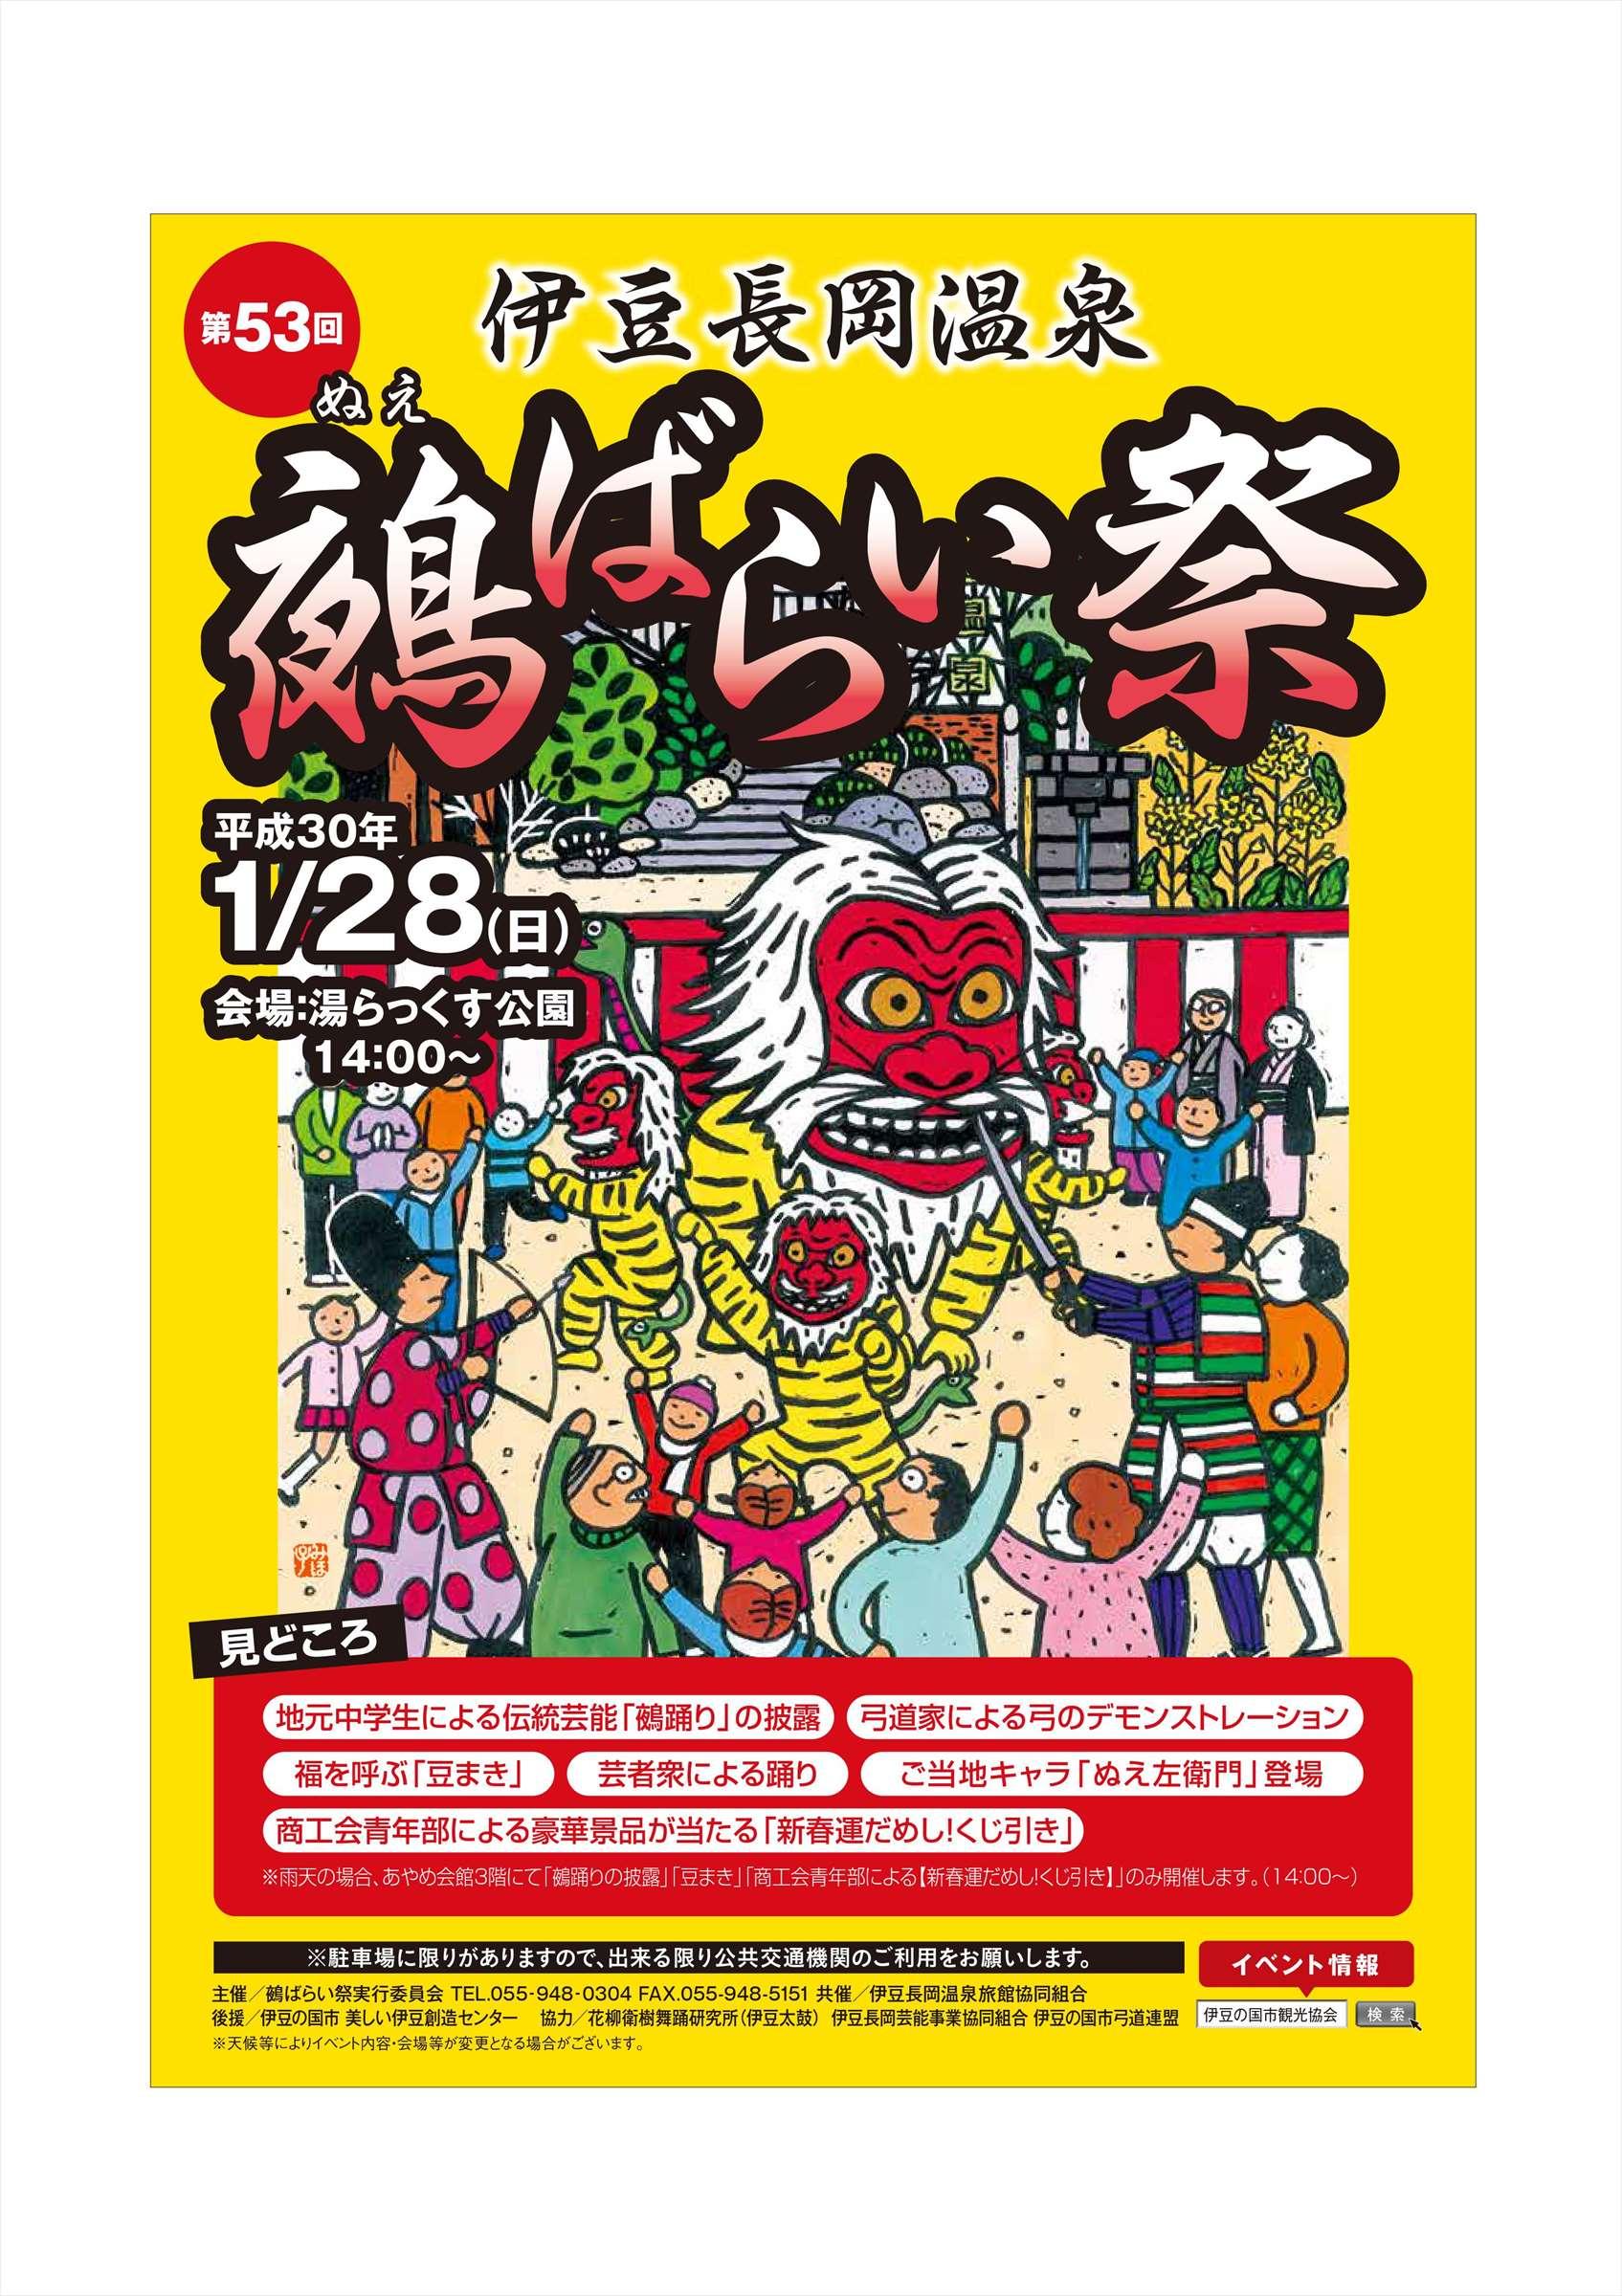 align:none link:0 alt:0 1/28(日)伊豆長岡温泉 鵺ばらい祭開催!l